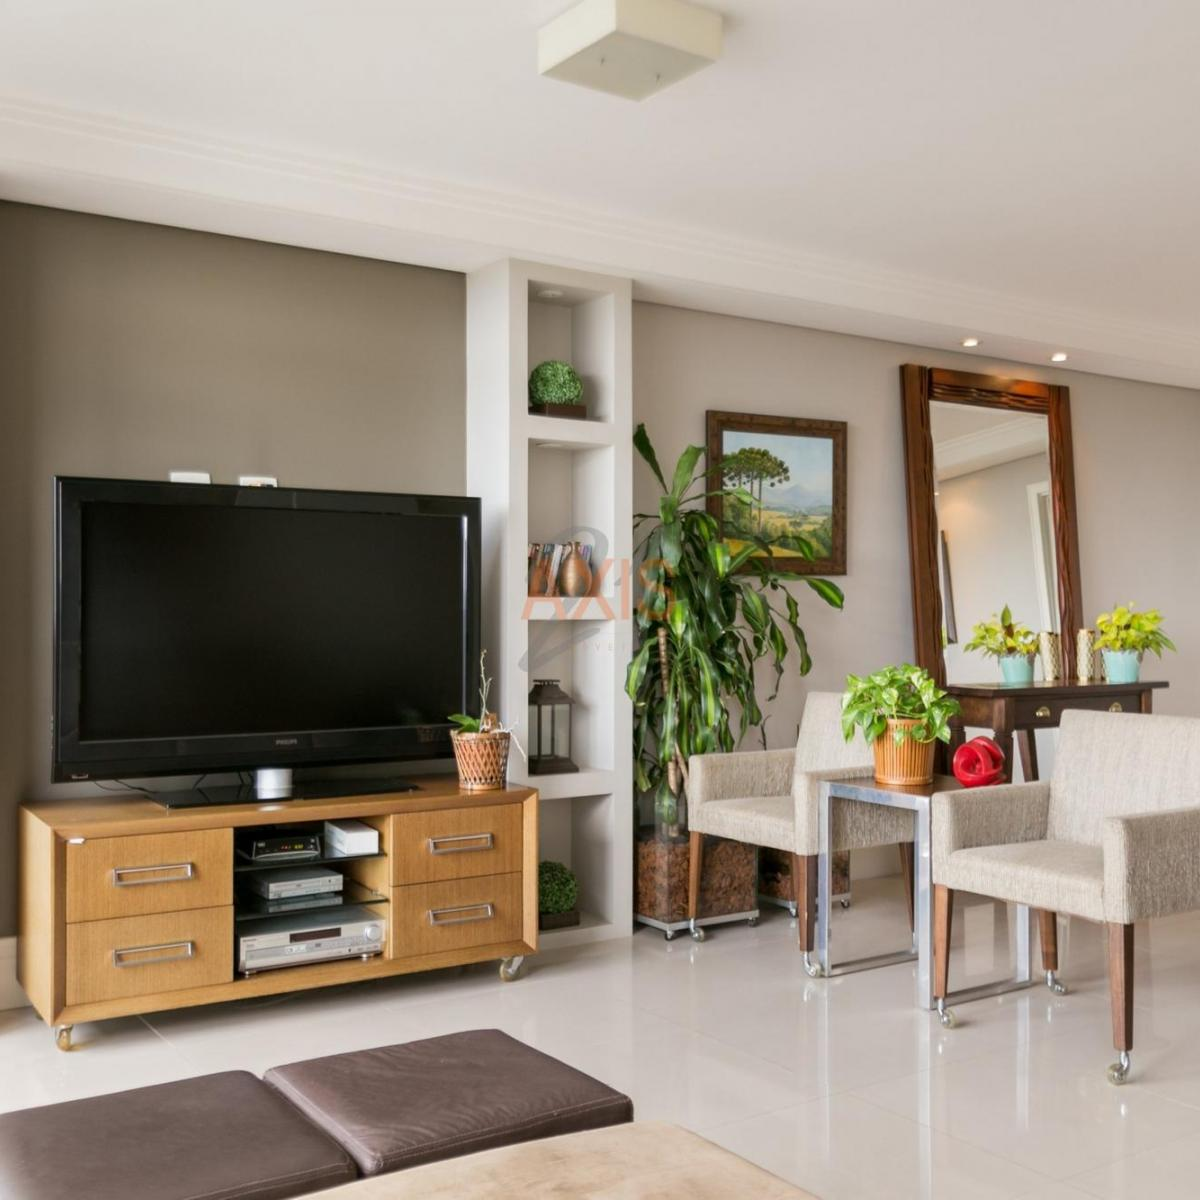 http://www.infocenterhost2.com.br/crm/fotosimovel/462199/106489894-apartamento-curitiba-champagnat_marcadagua.jpg